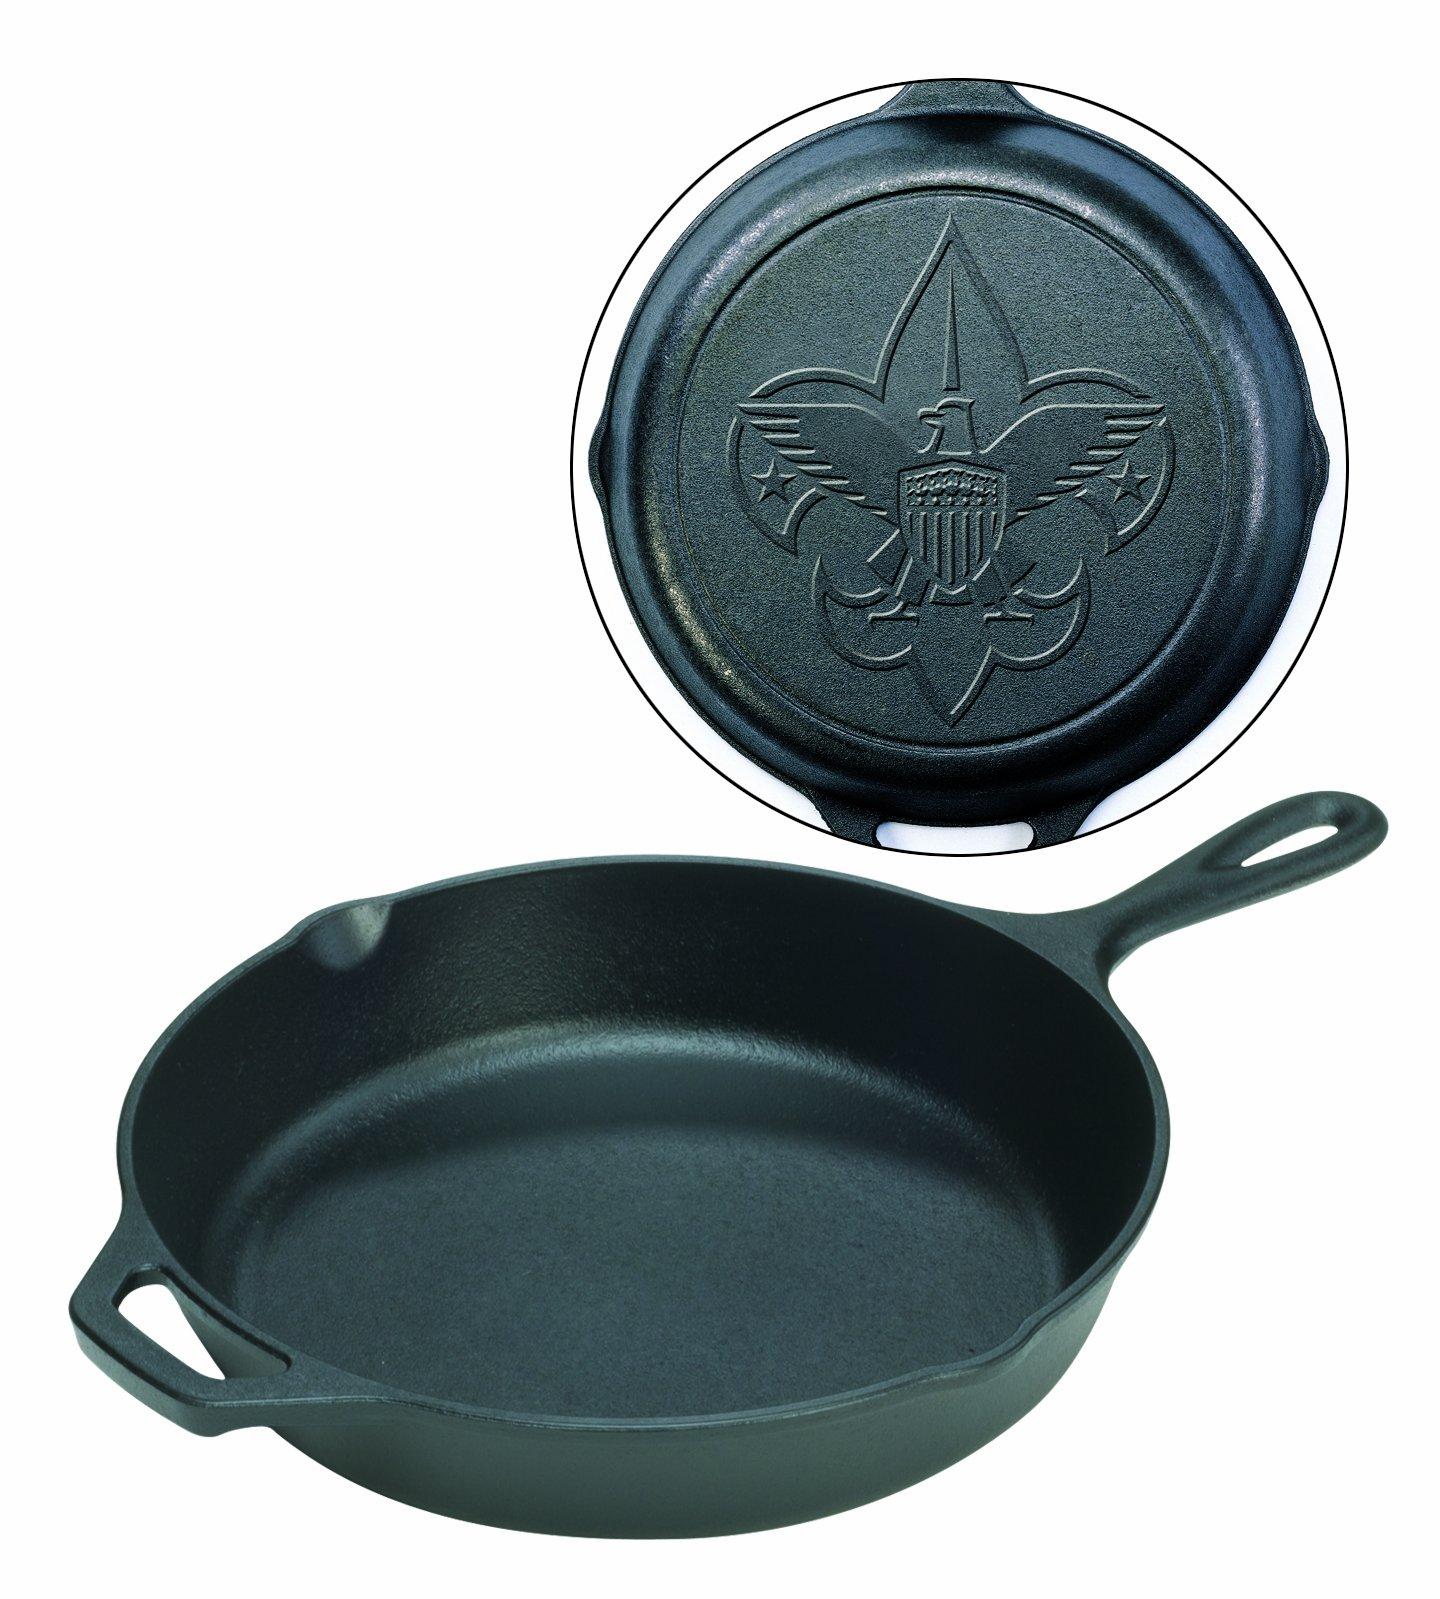 Lodge Boy Scouts of America Pre-Seasoned 12-Inch Skillet by Lodge